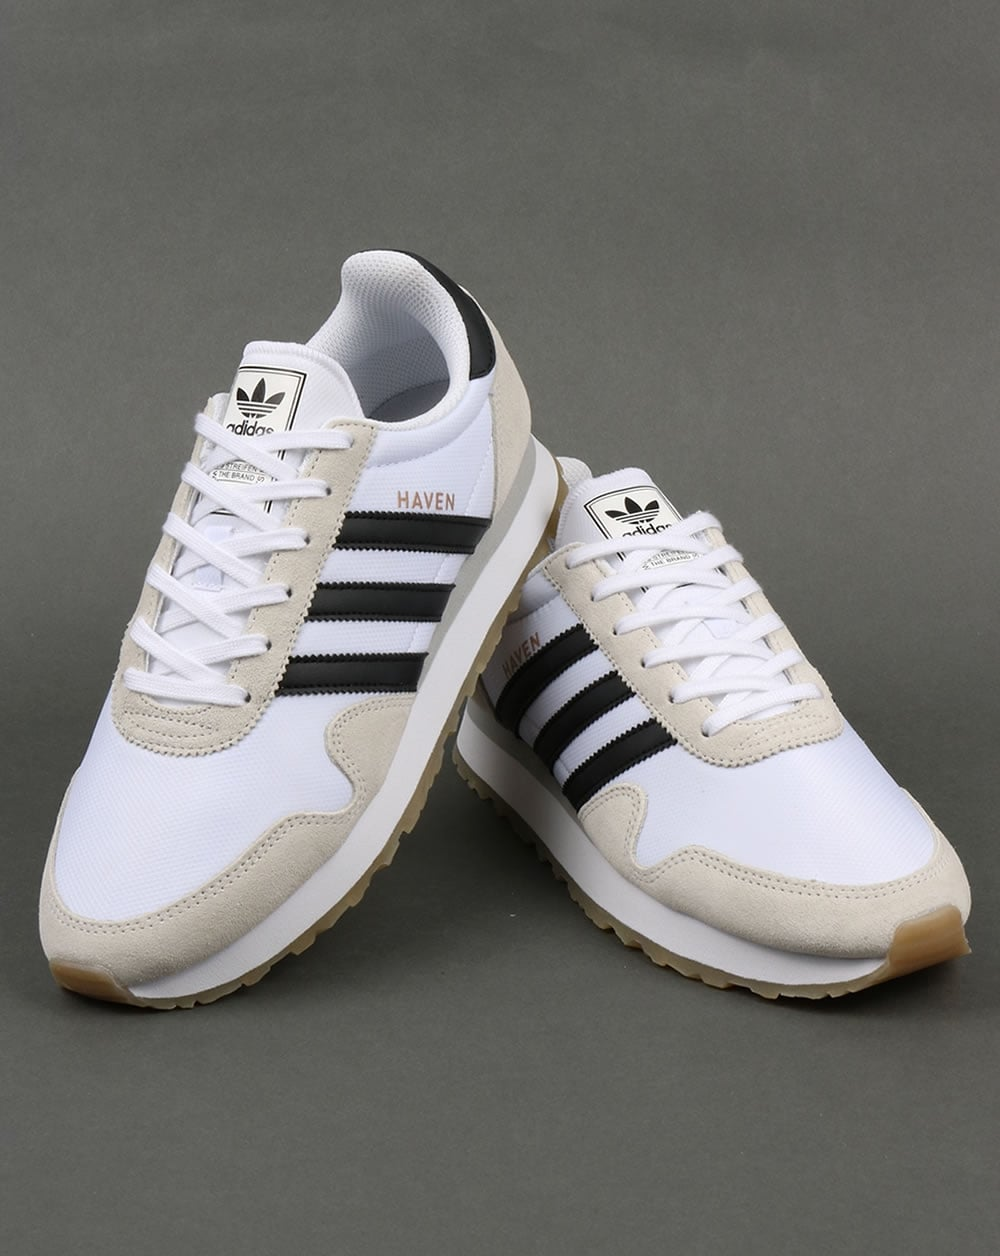 Adidas Haven Trainers White/Black/Gum,originals,runner ...